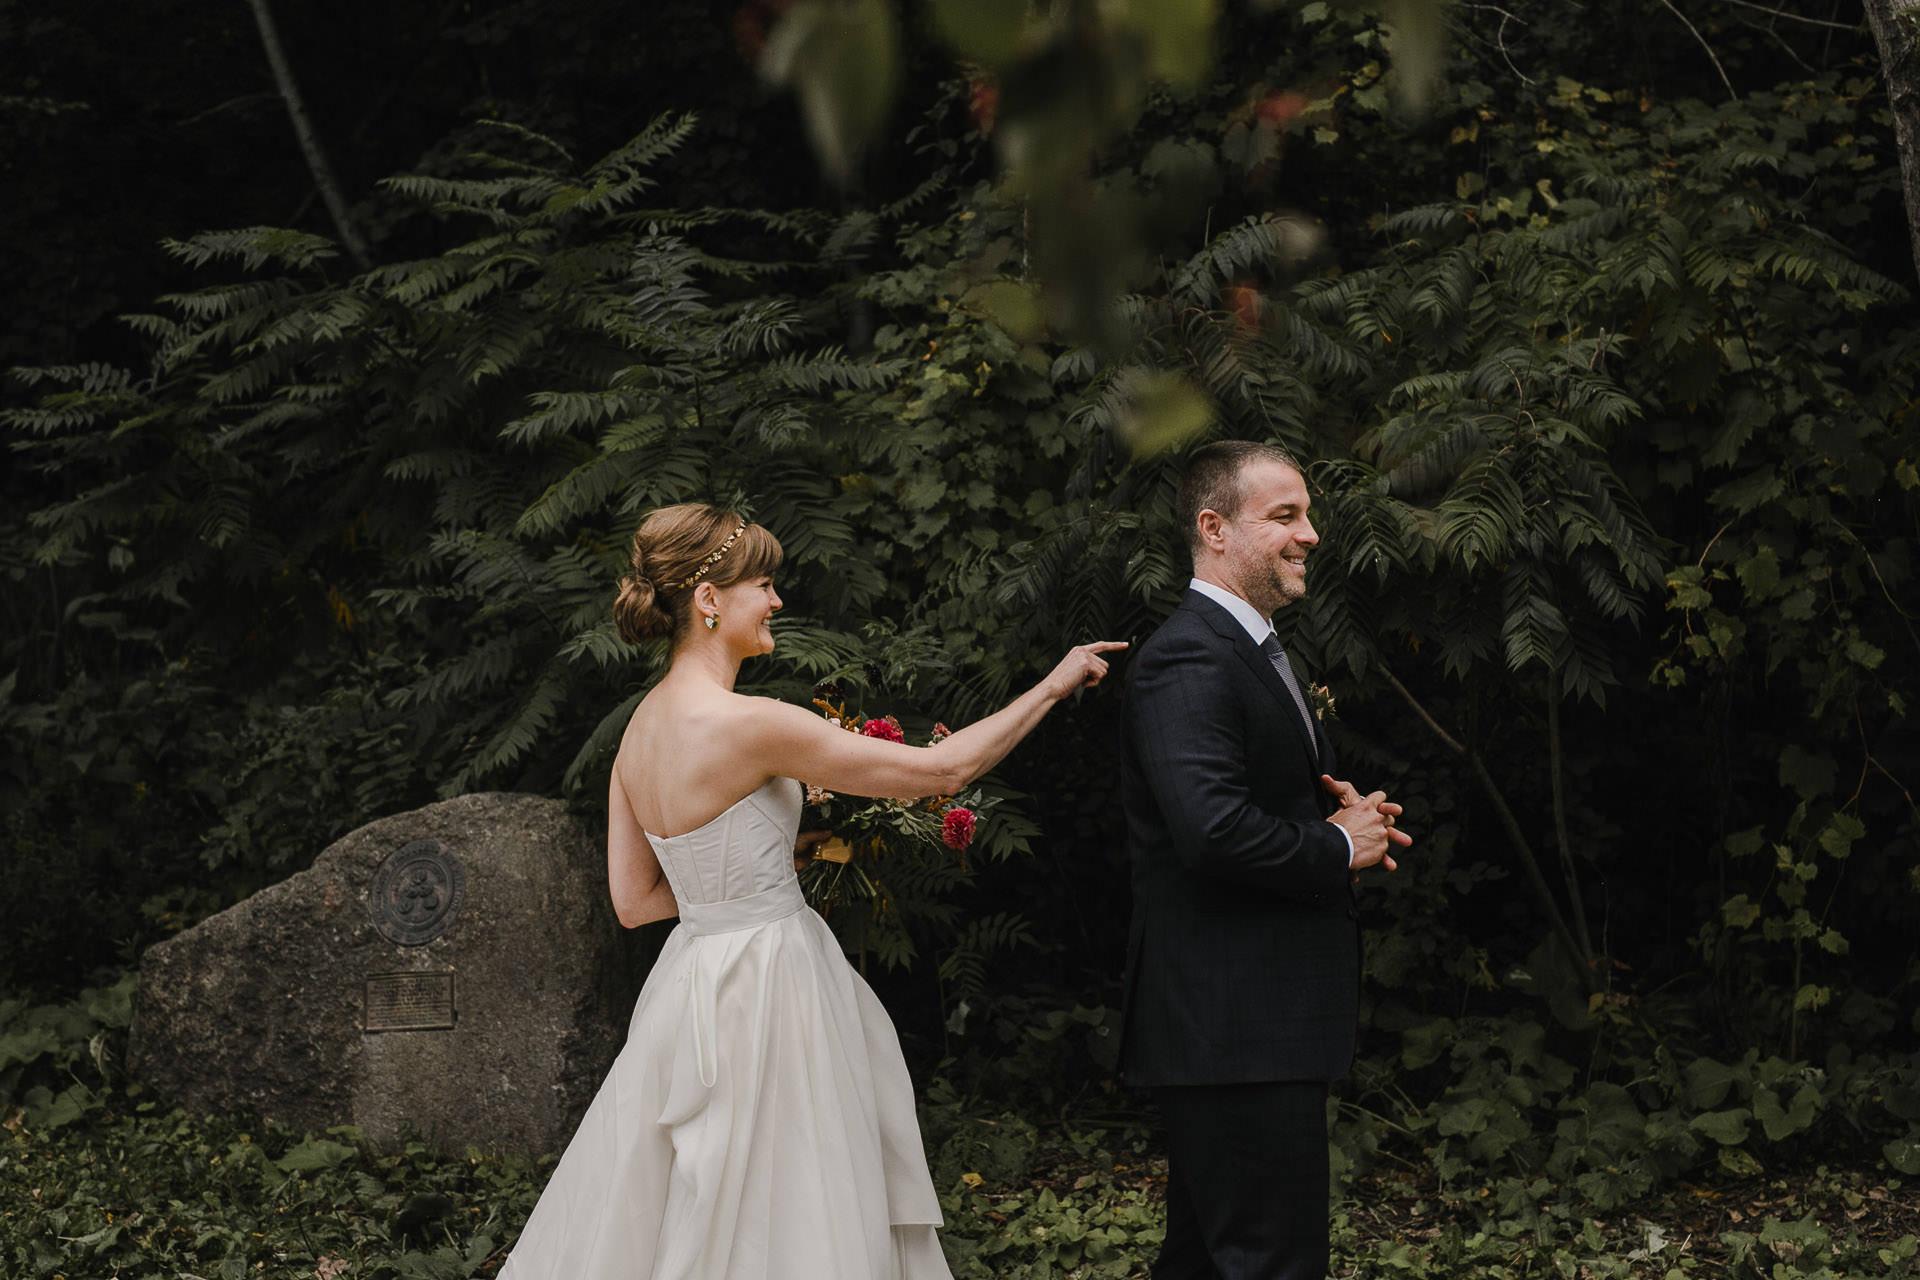 Evergreen Brickworks wedding photographer - first look